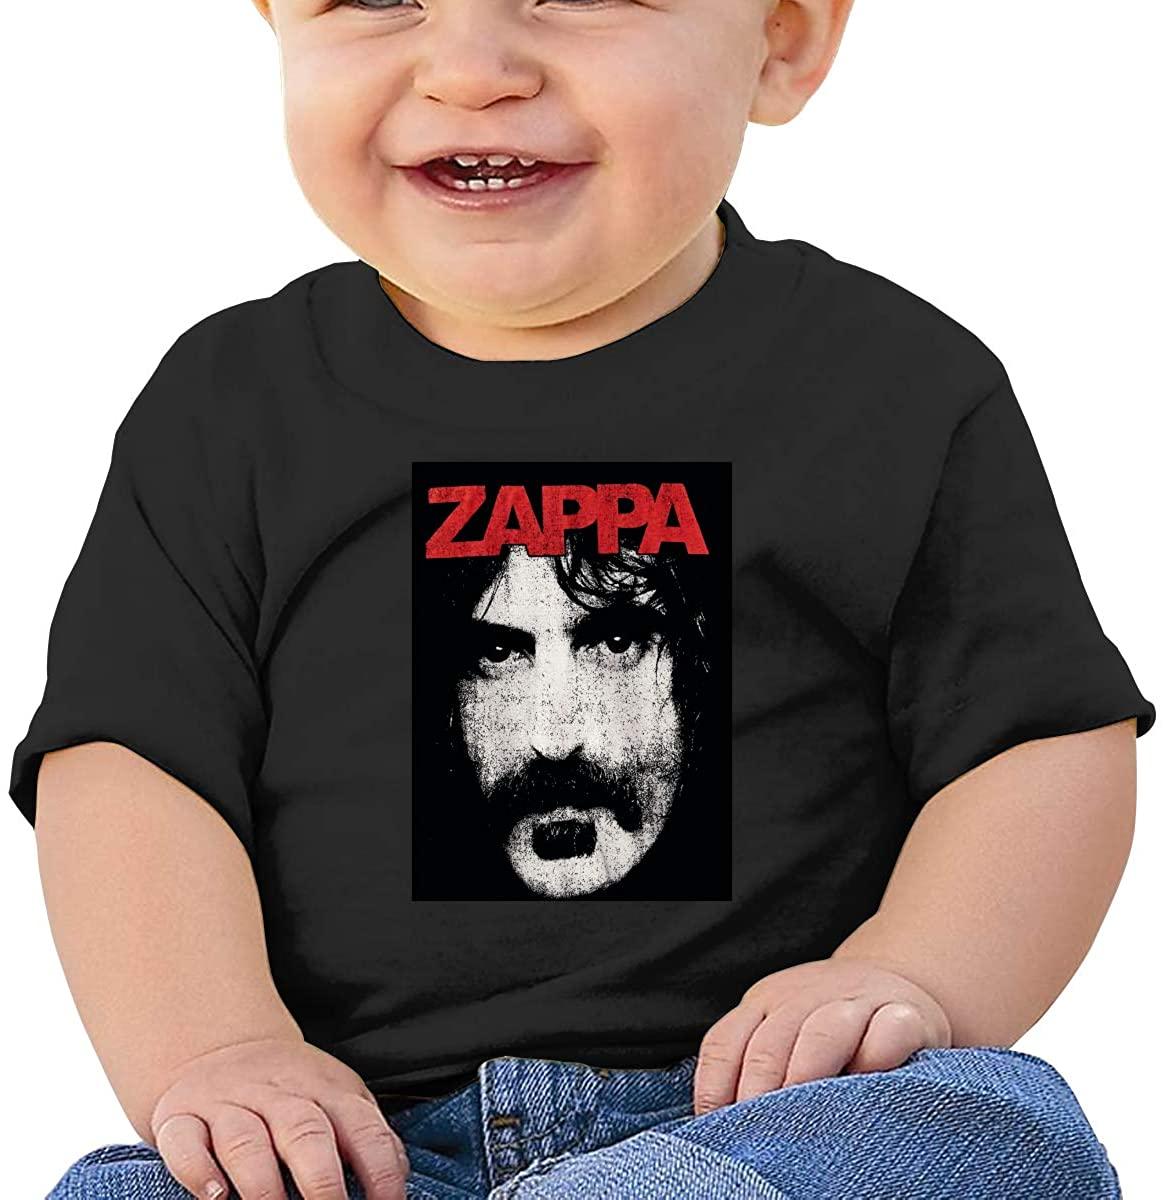 Fgrtyt Baby Frank Zappa Short Sleeve Cotton Graphic Tee T-Shirt